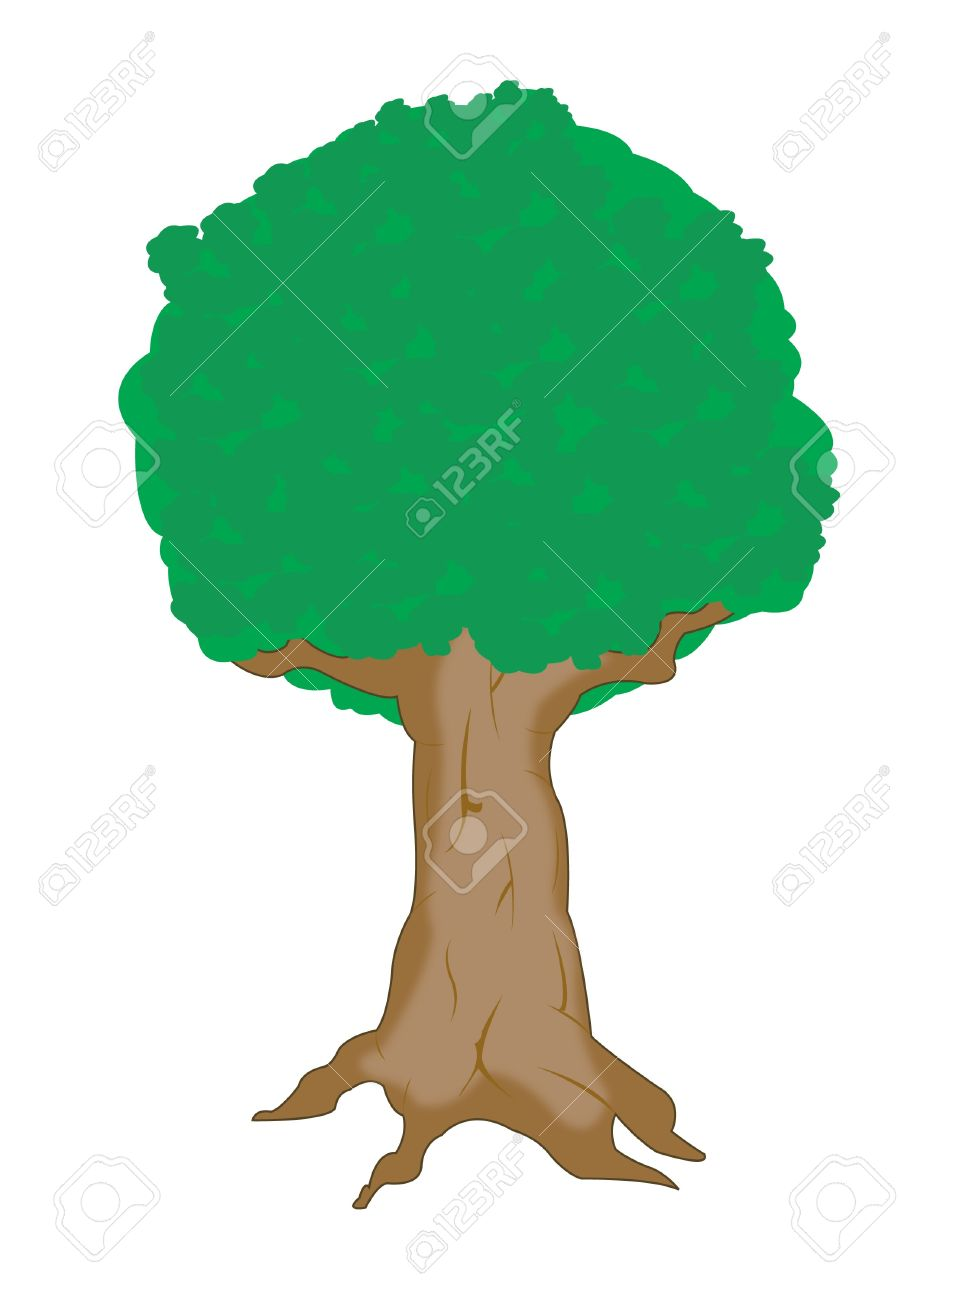 Big Tree Drawing at GetDrawings.com | Free for personal use Big Tree ...